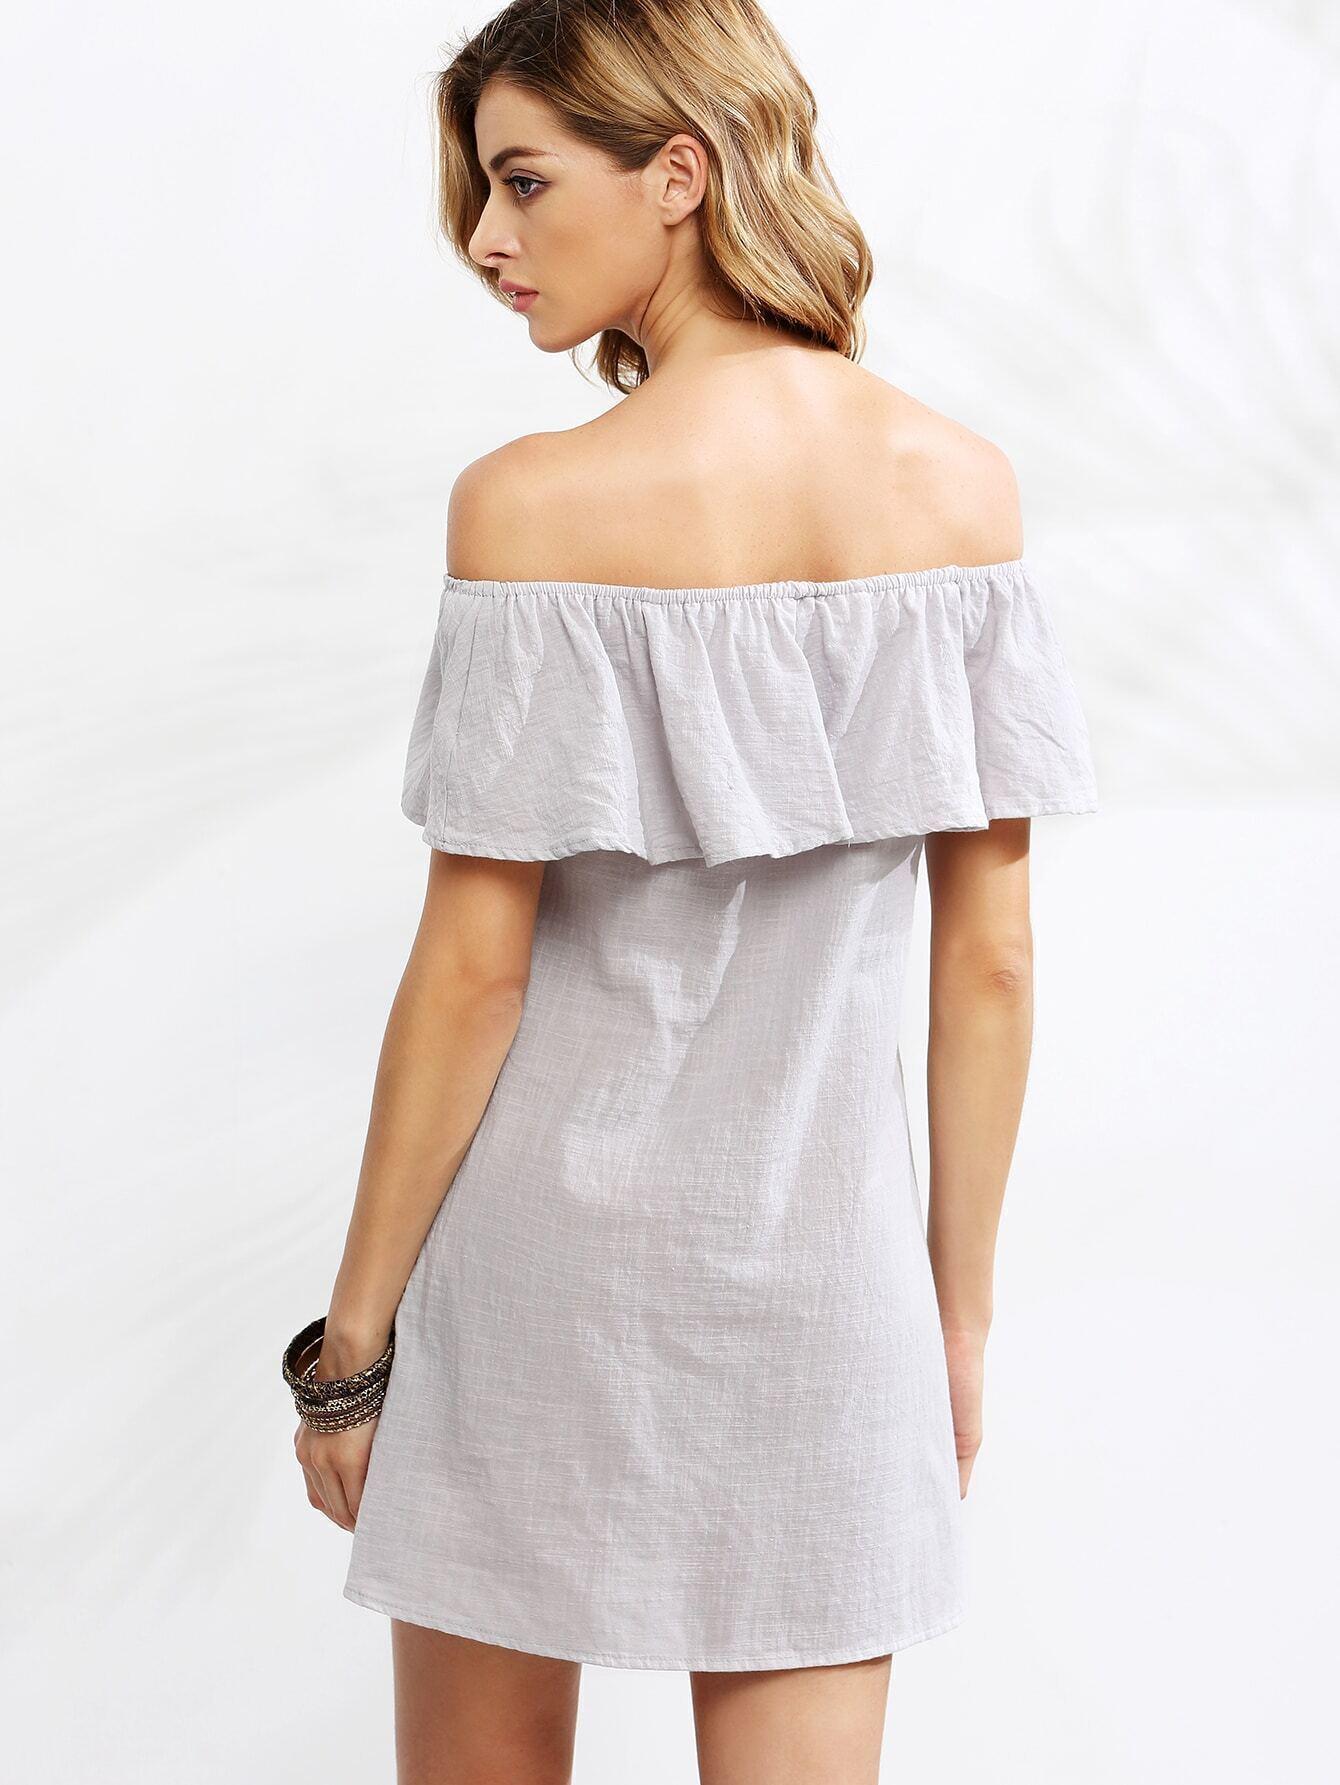 37c4495d03 Grey Off The Shoulder Ruffle Dress EmmaCloth-Women Fast Fashion Online